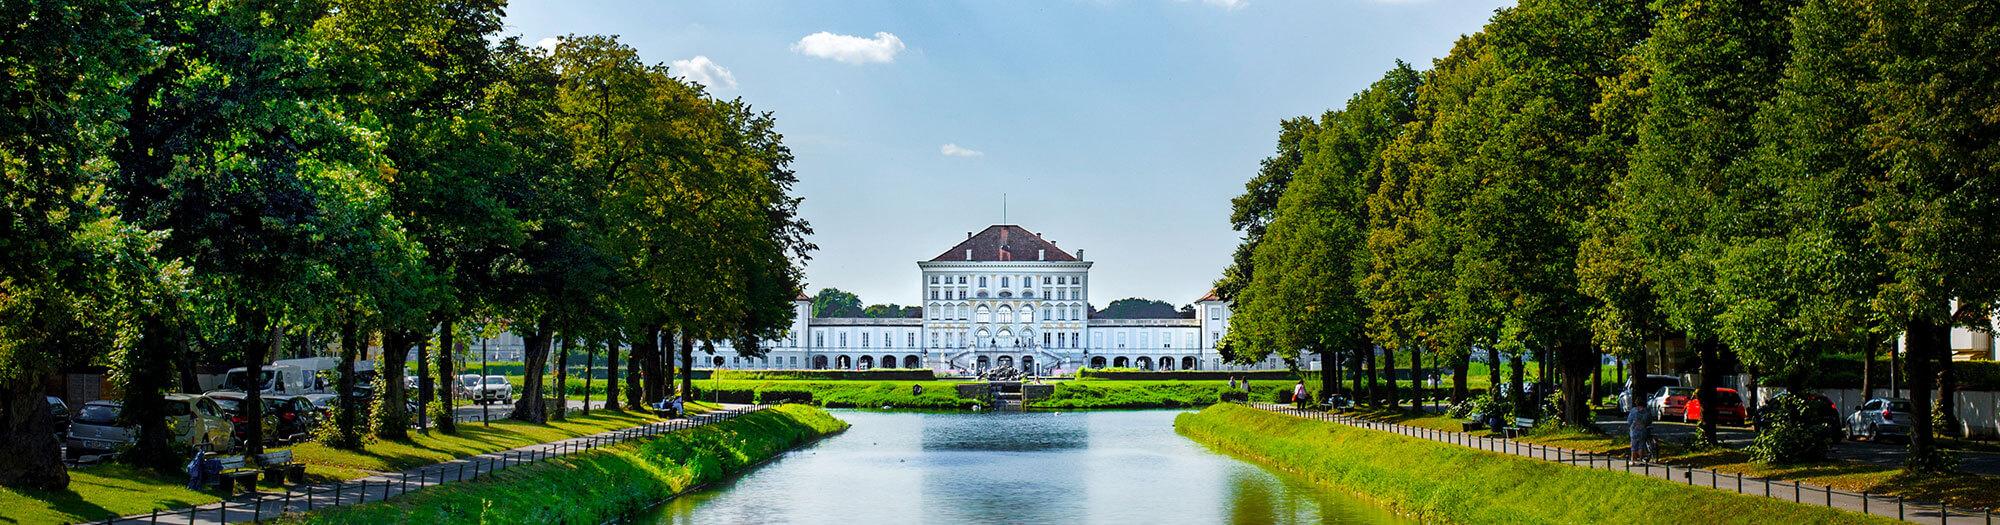 Nymphenburger Schloss ´München